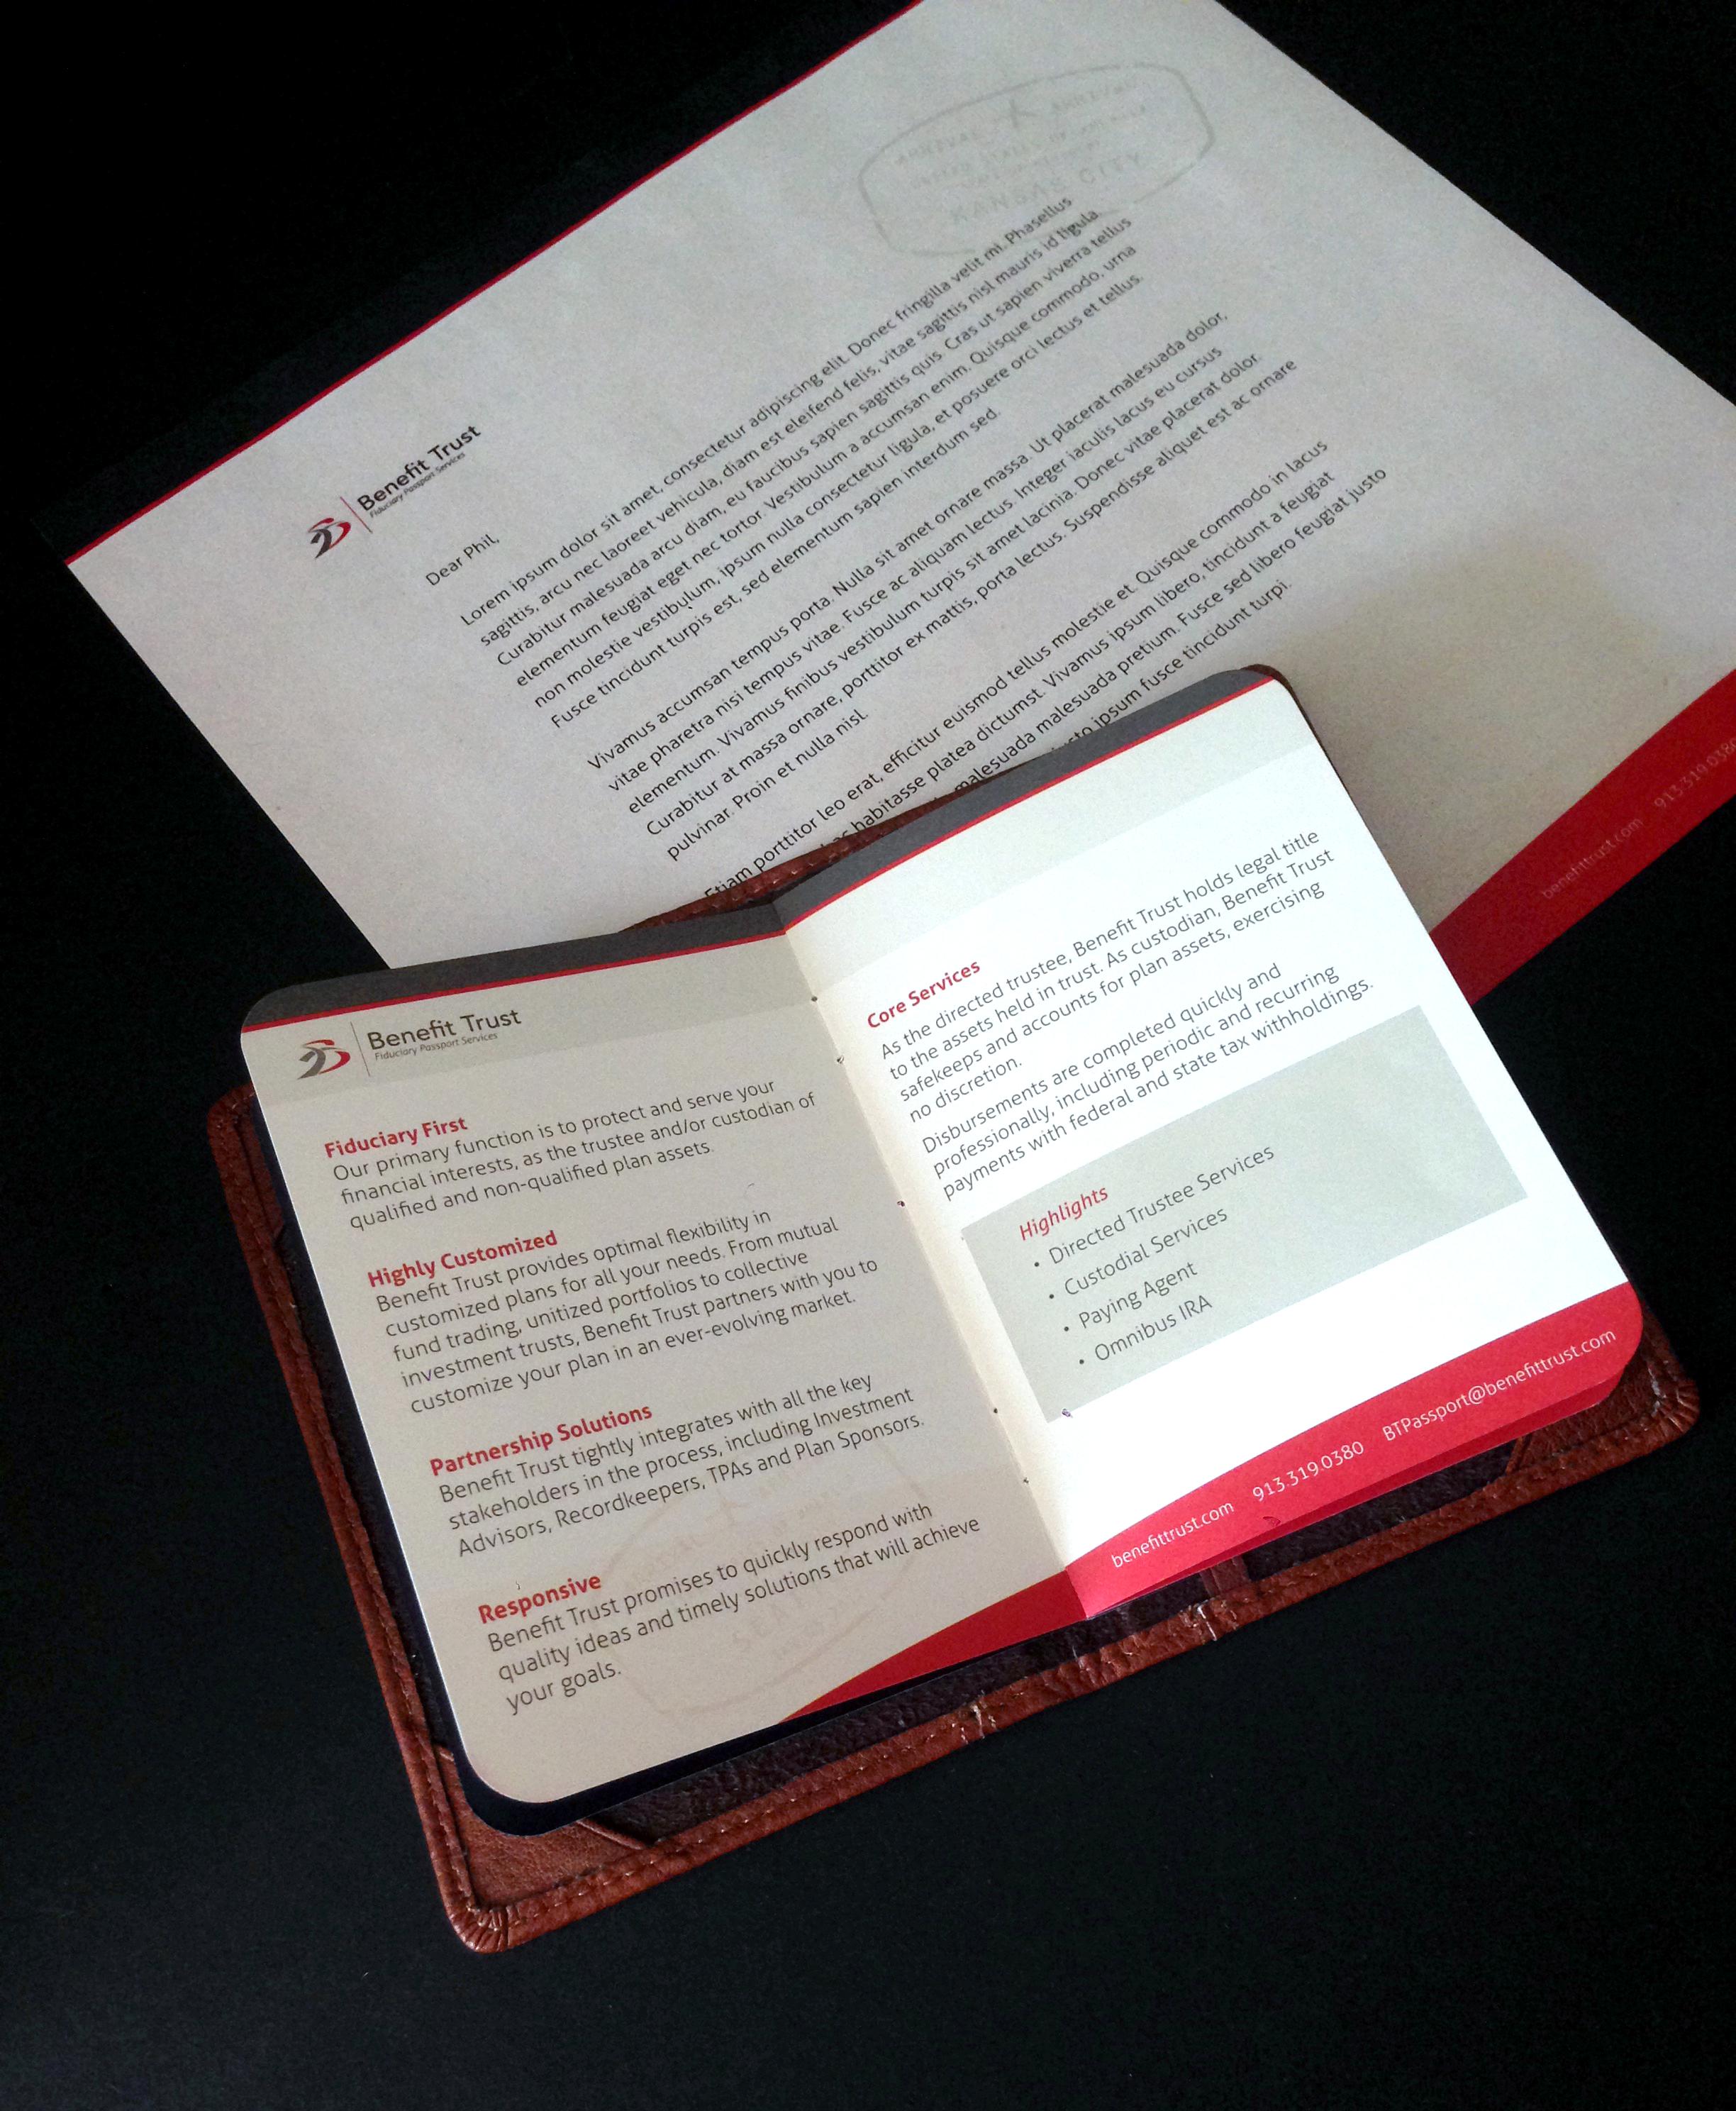 BenefitTrust_Passport-Open.png